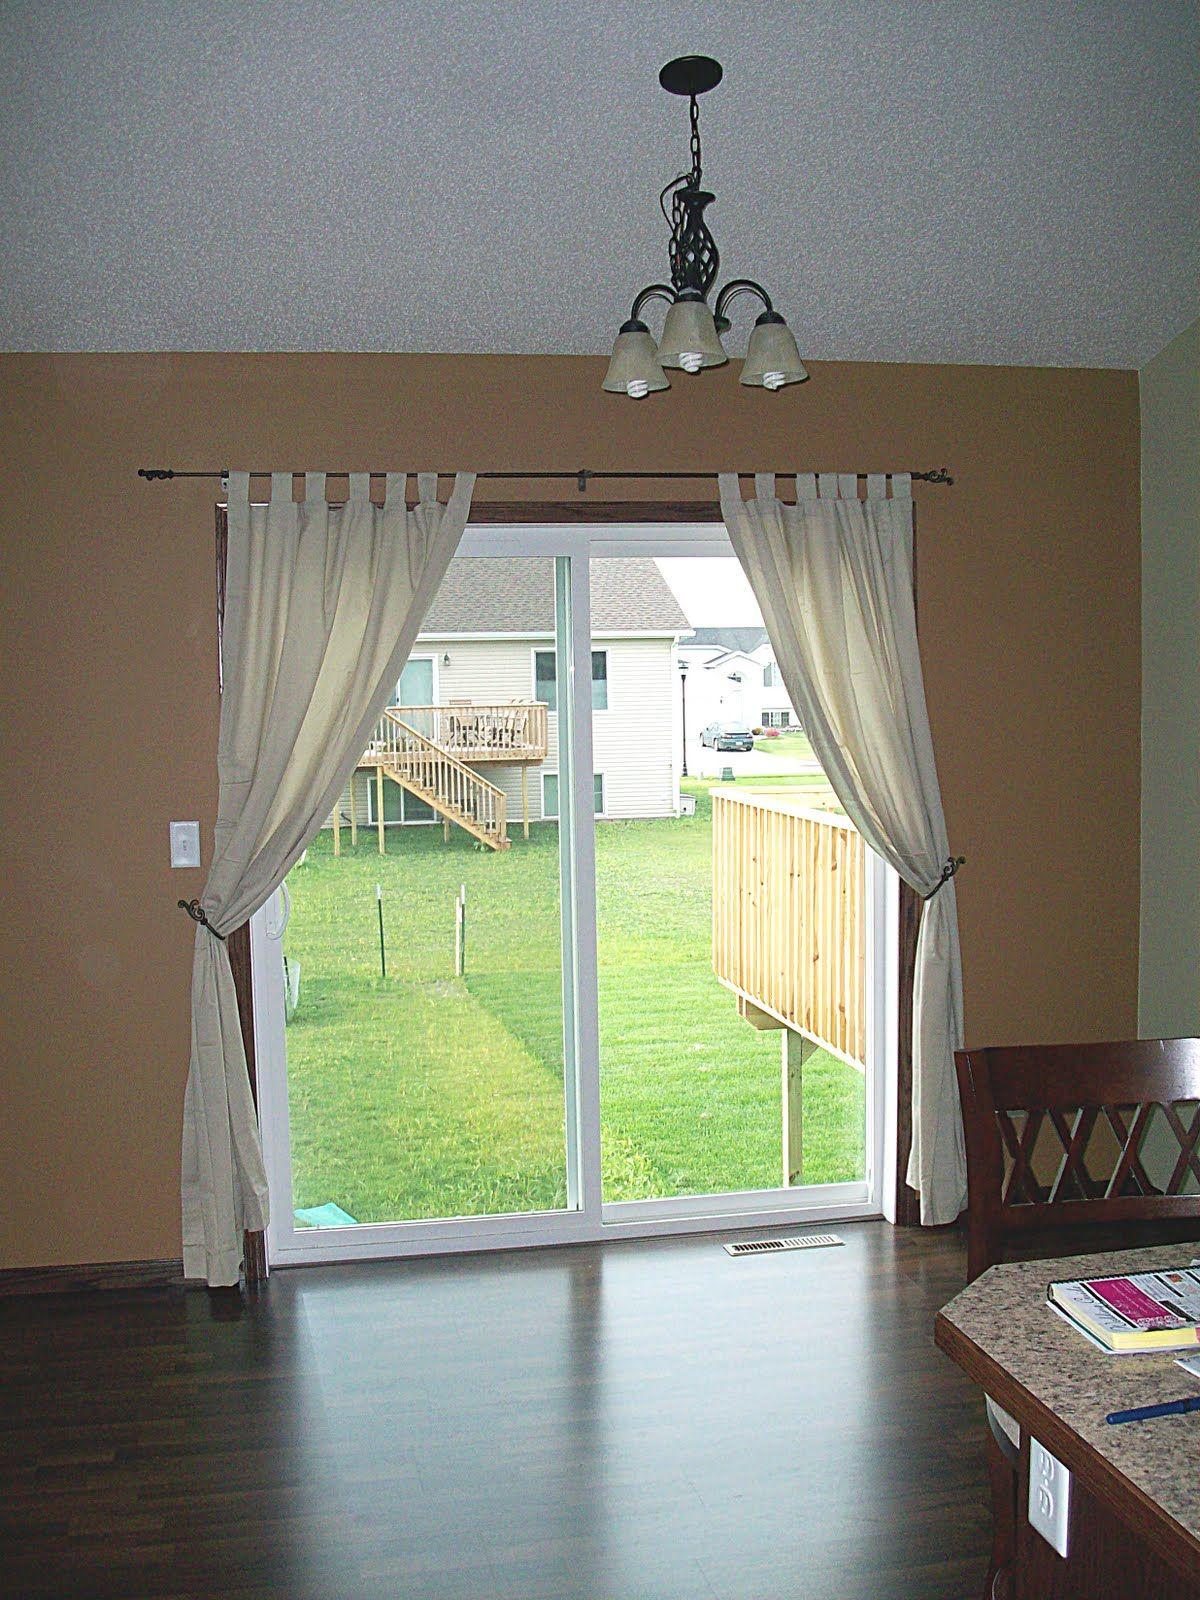 Sliding patio door curtains ideas - Sliding Door Curtain